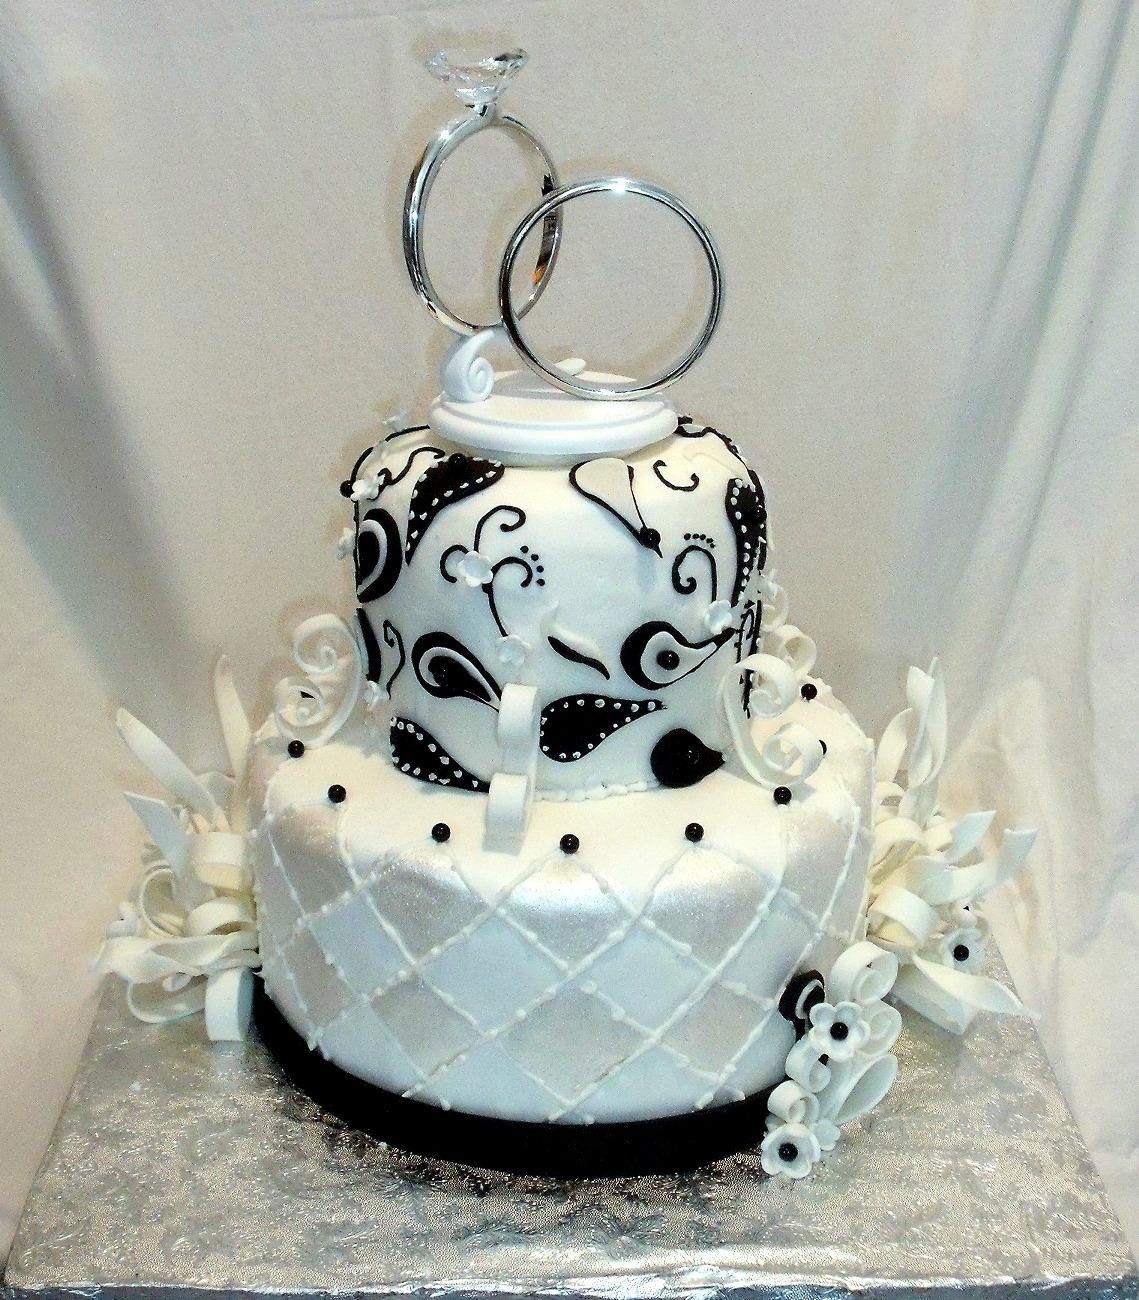 Anniversary Paisley Streamers Black White Fondant Cake Main